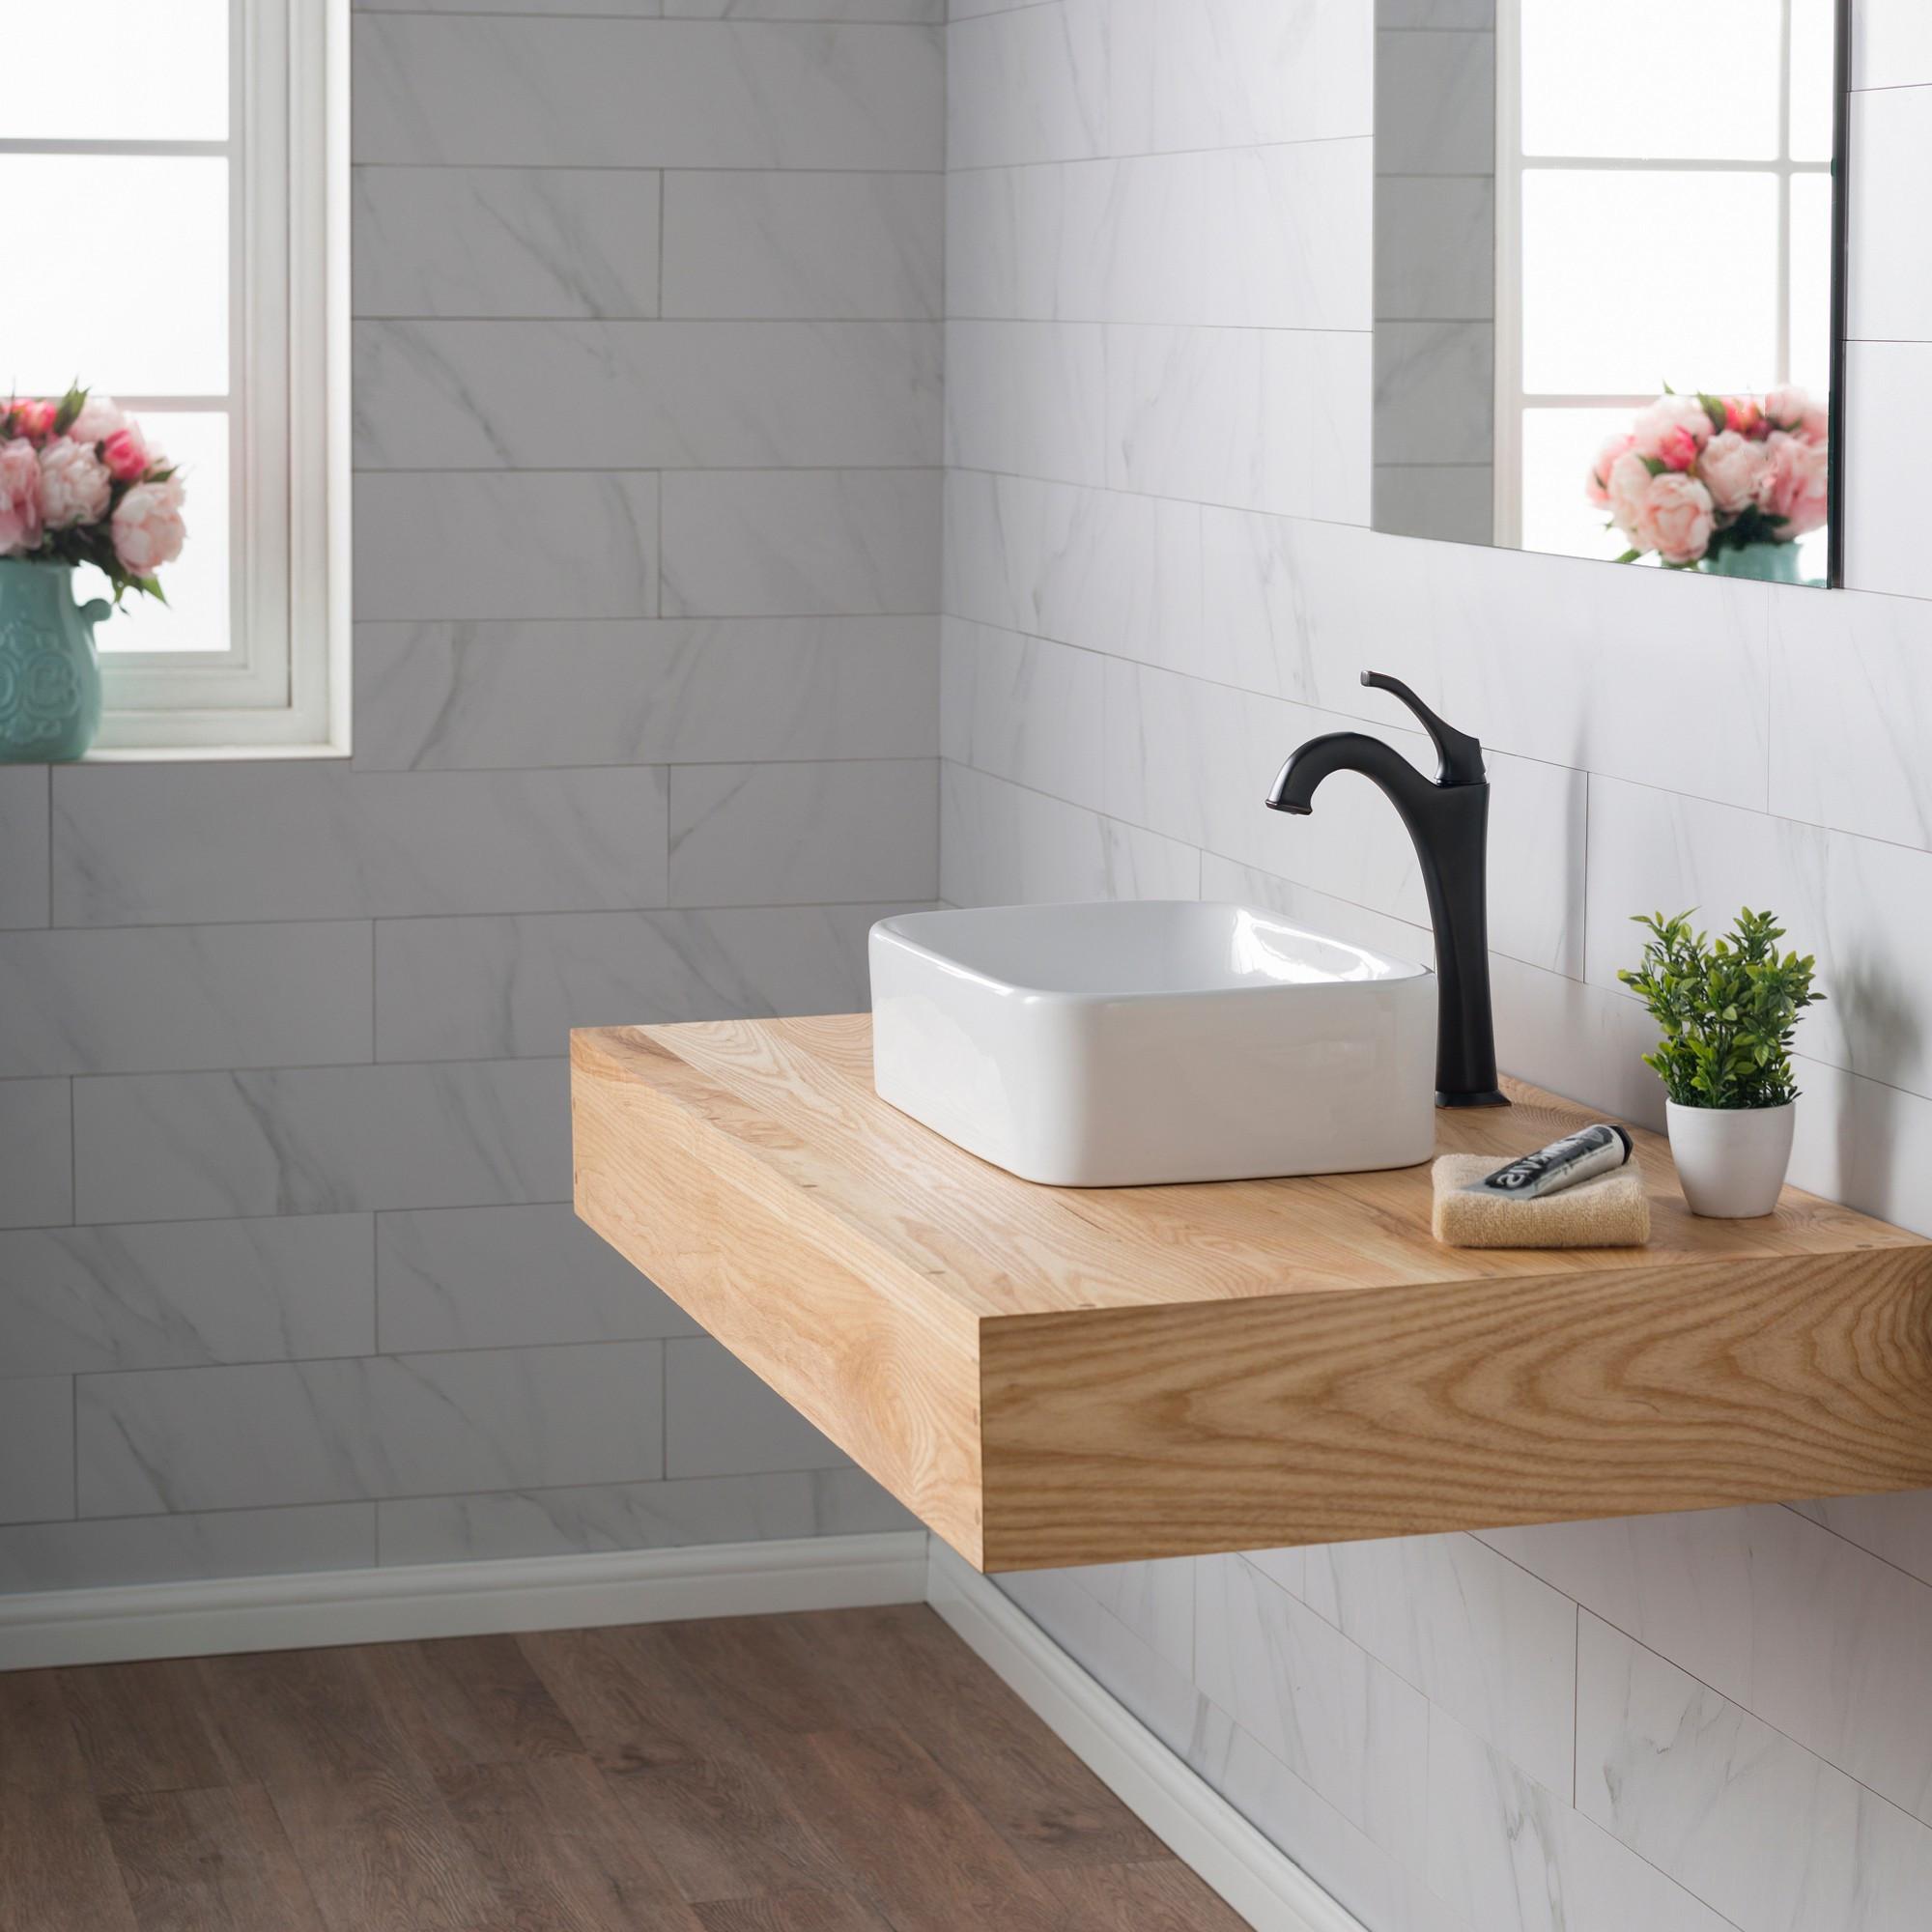 kraus hardwood flooring reviews of ceramic sink kraususa com in kraus elavo rectangular vessel white porcelain ceramic bathroom sink 19 inch